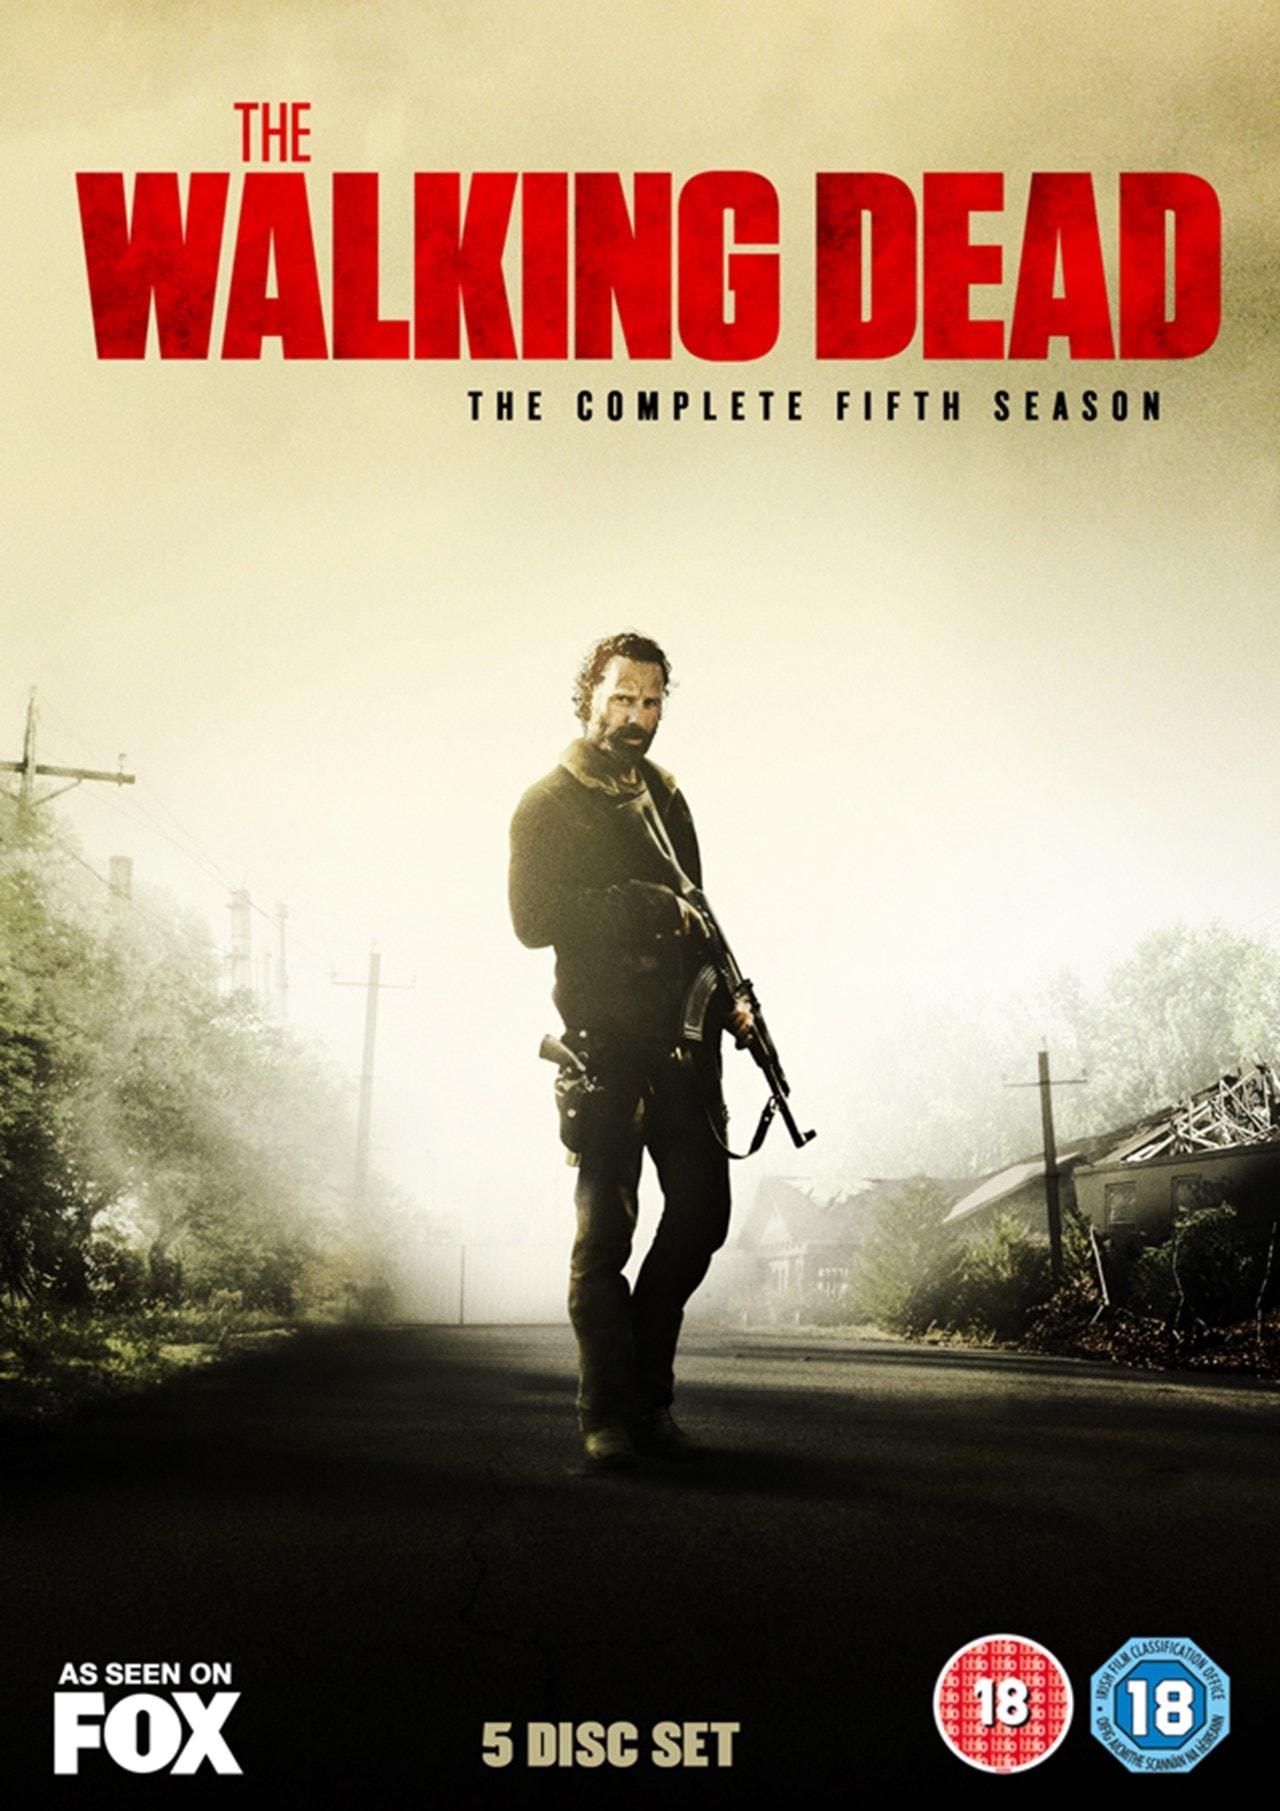 The Walking Dead: The Complete Fifth Season - 1